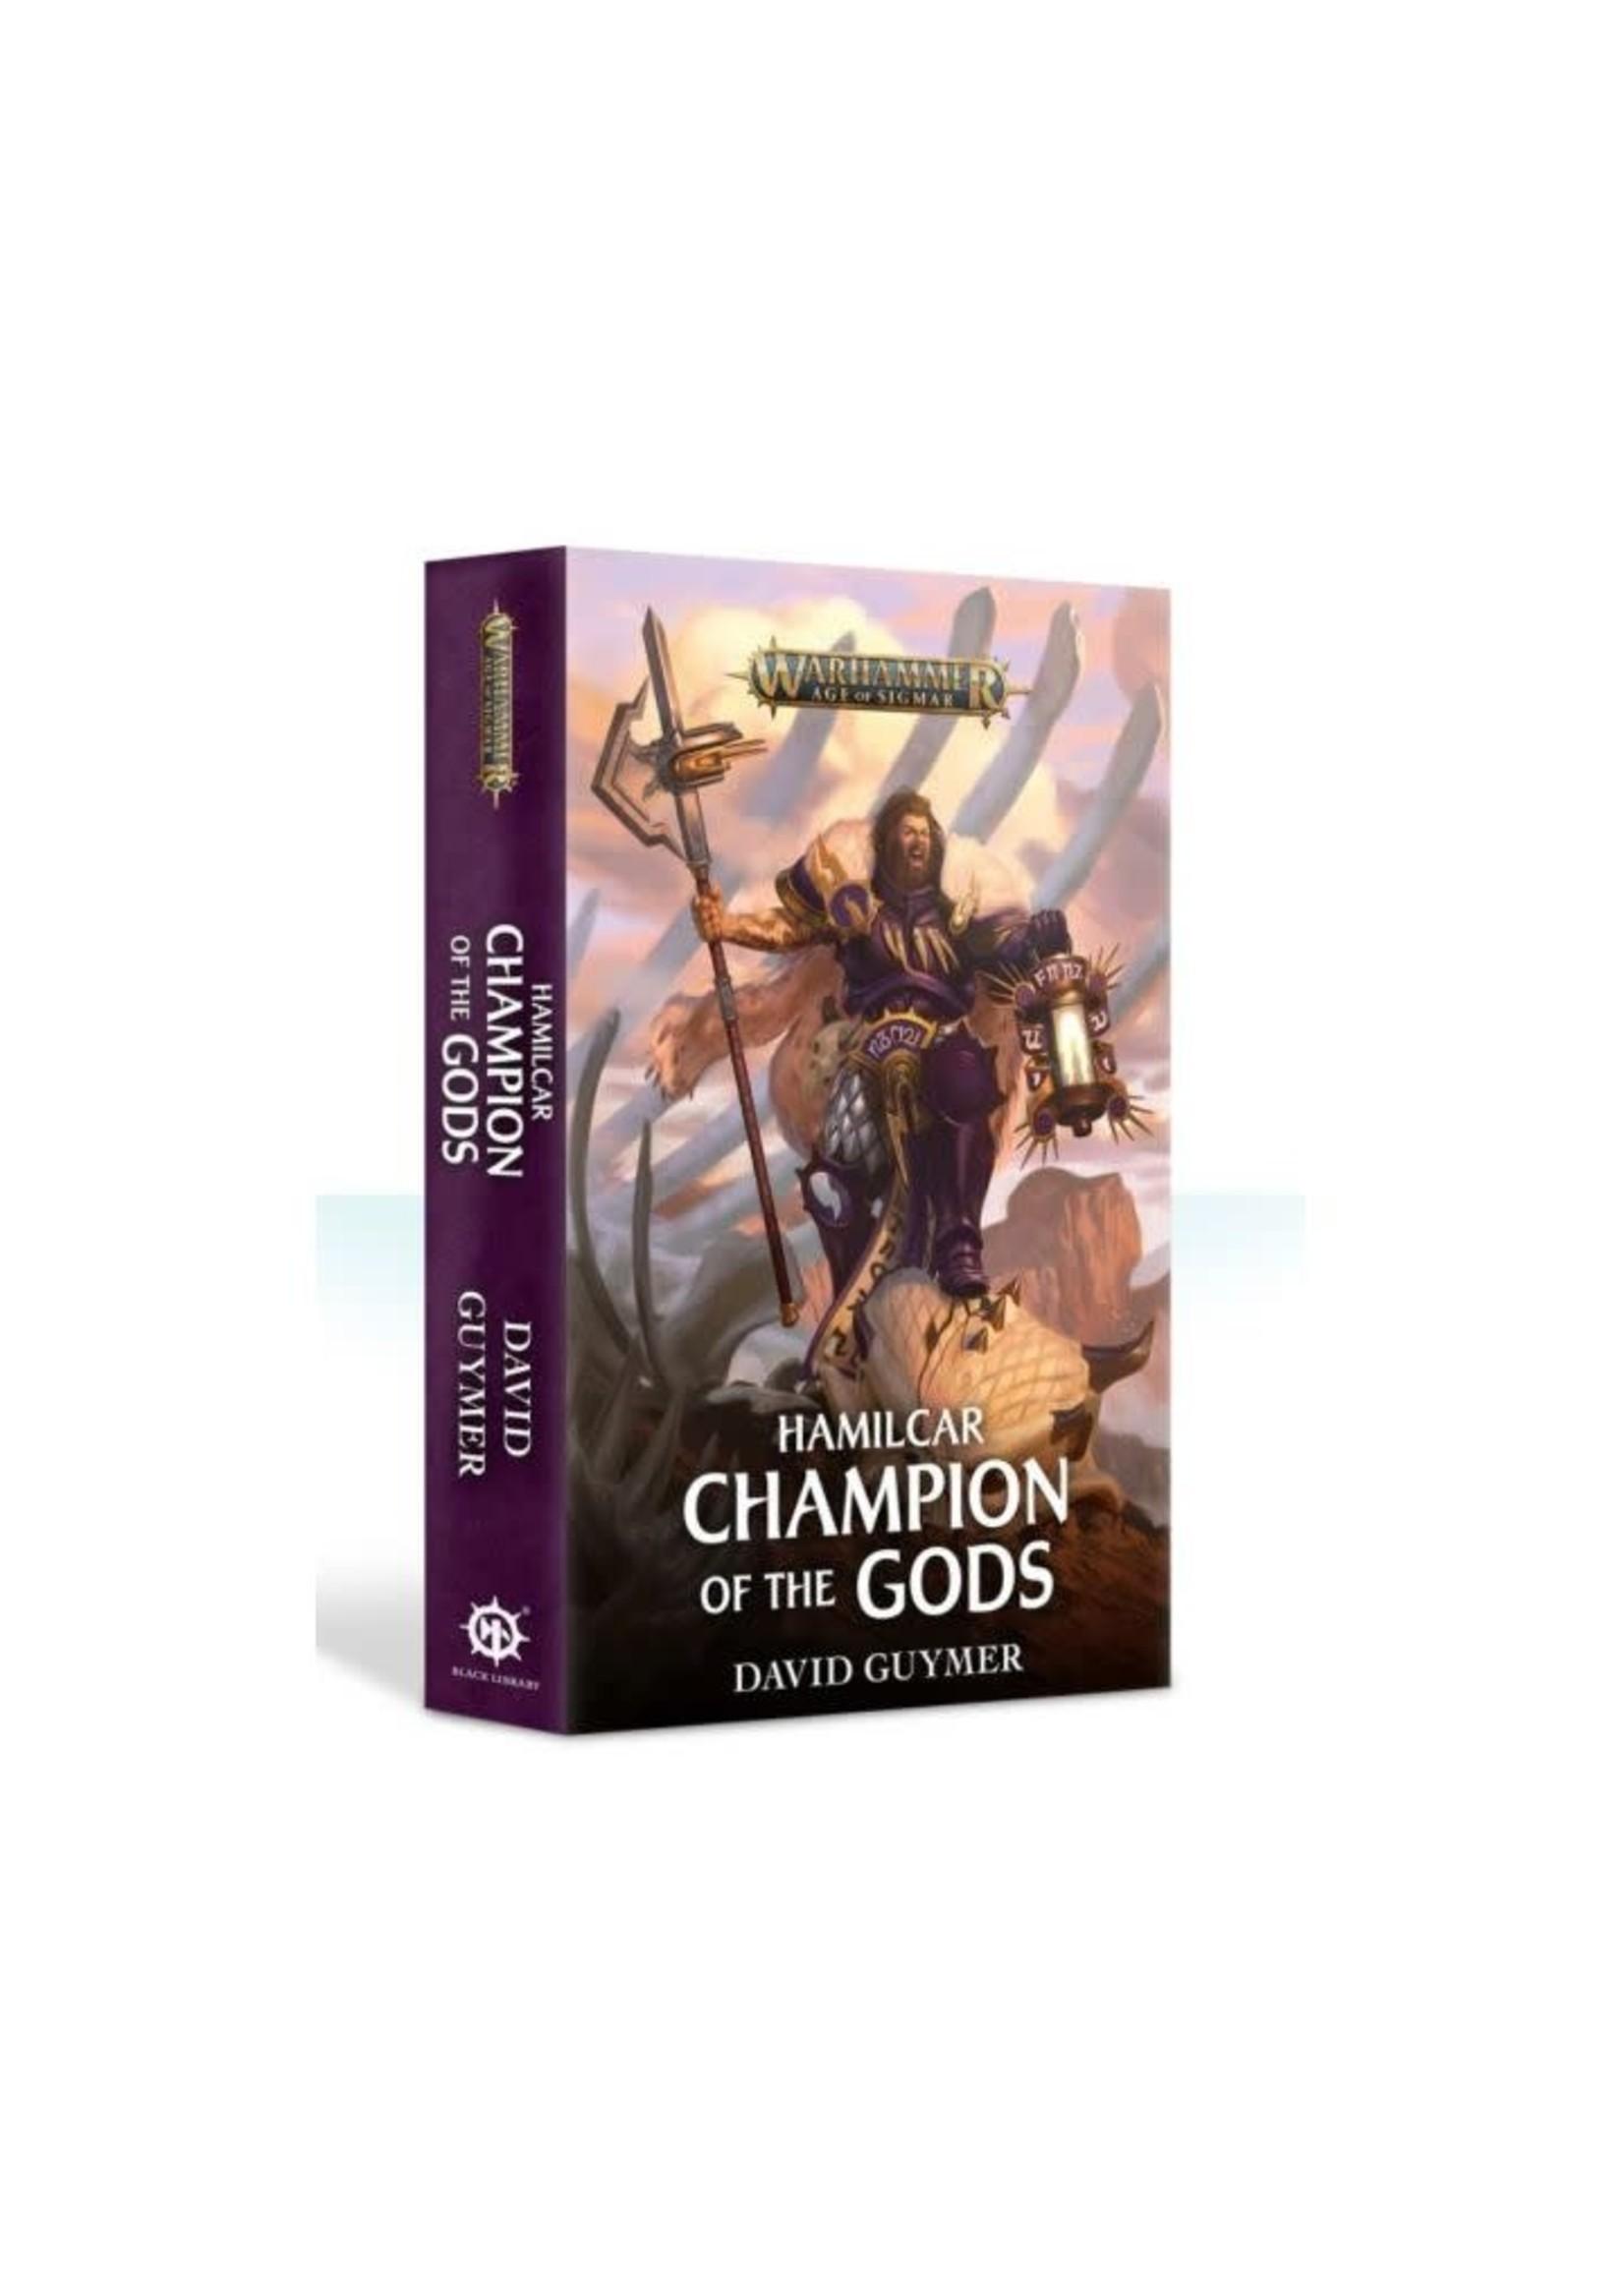 Hamilcar: Champion Of The Gods (Hb)